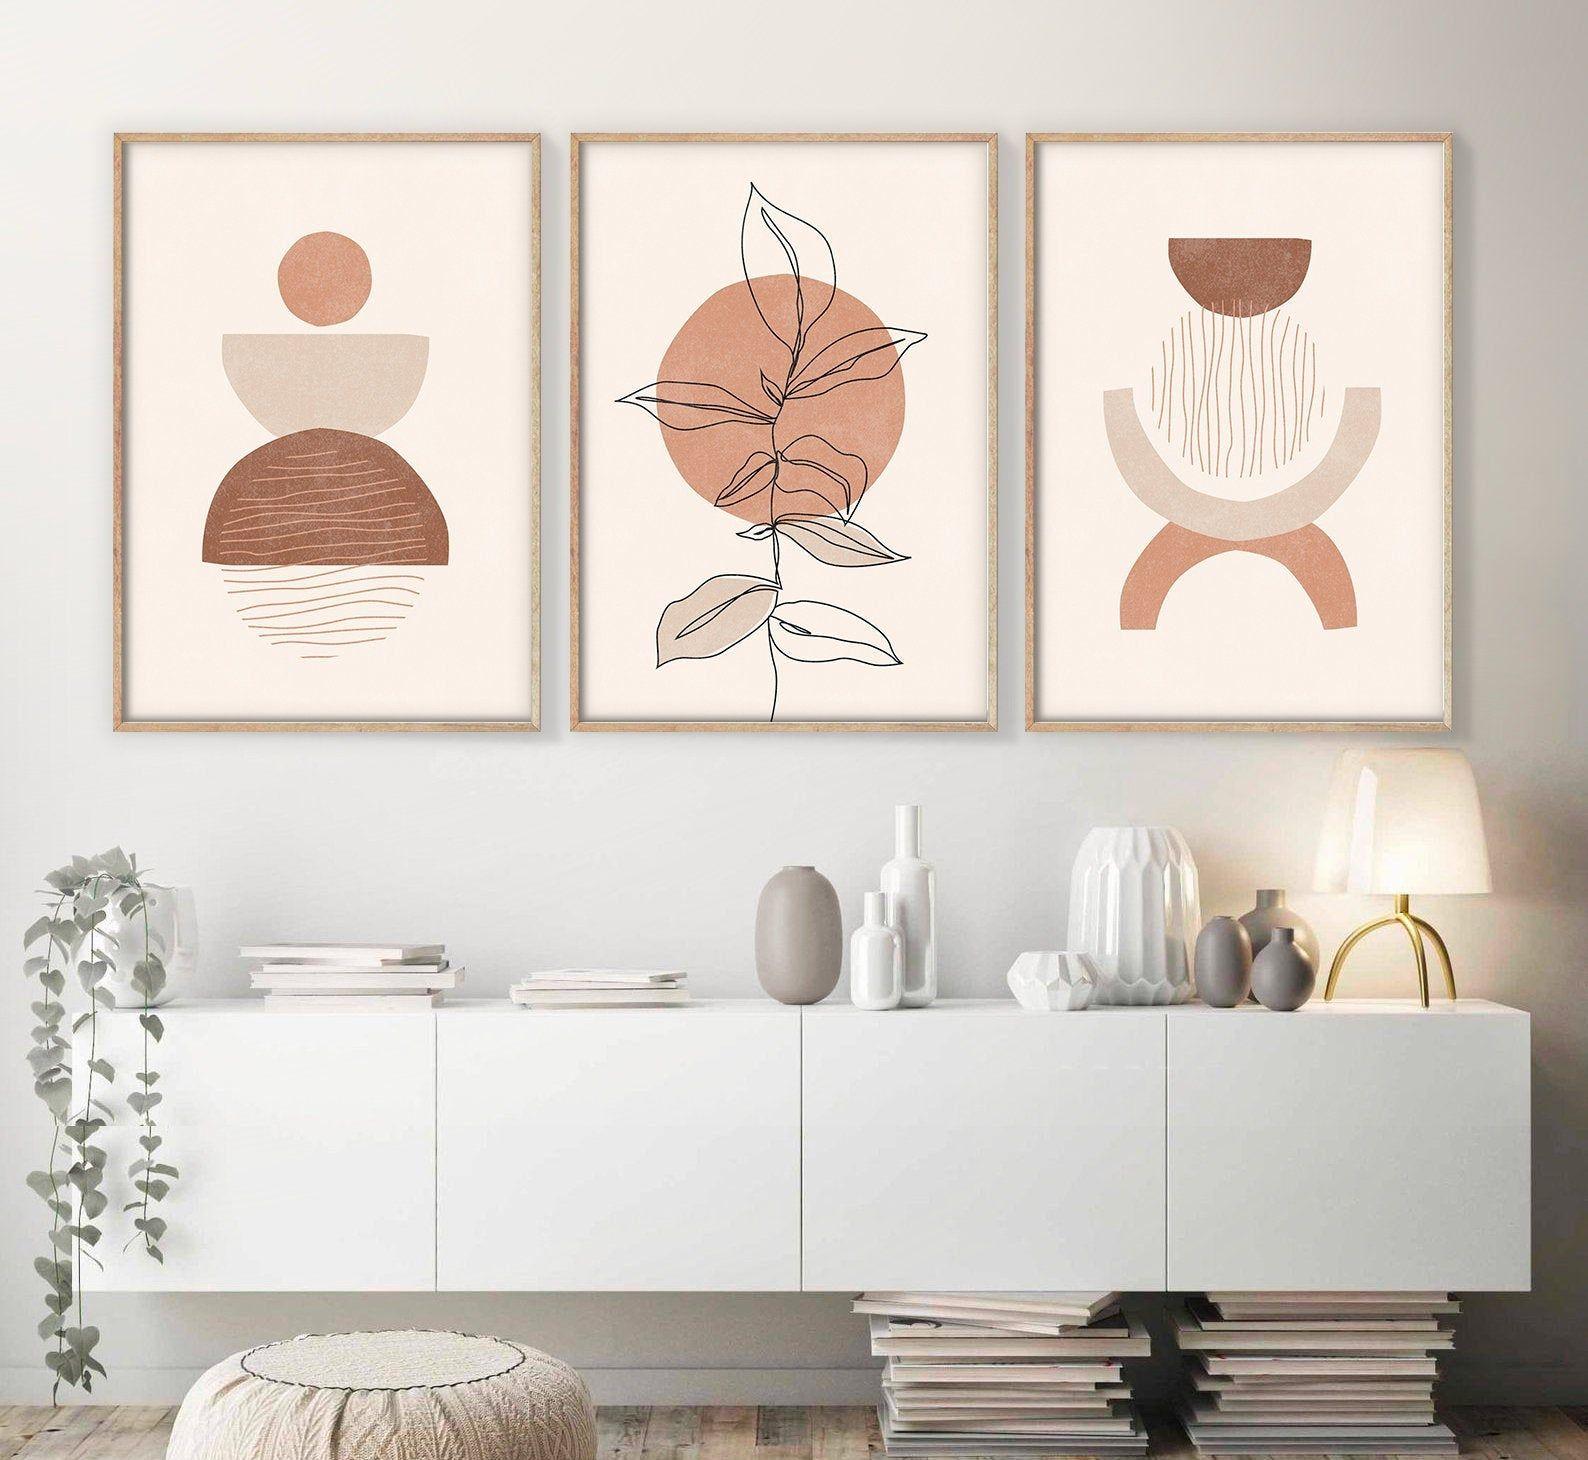 Boho Art Set Of 3 Prints Abstract Gallery Wall Set Boho Wall Etsy Boho Wall Art Gallery Wall Gallery Wall Set